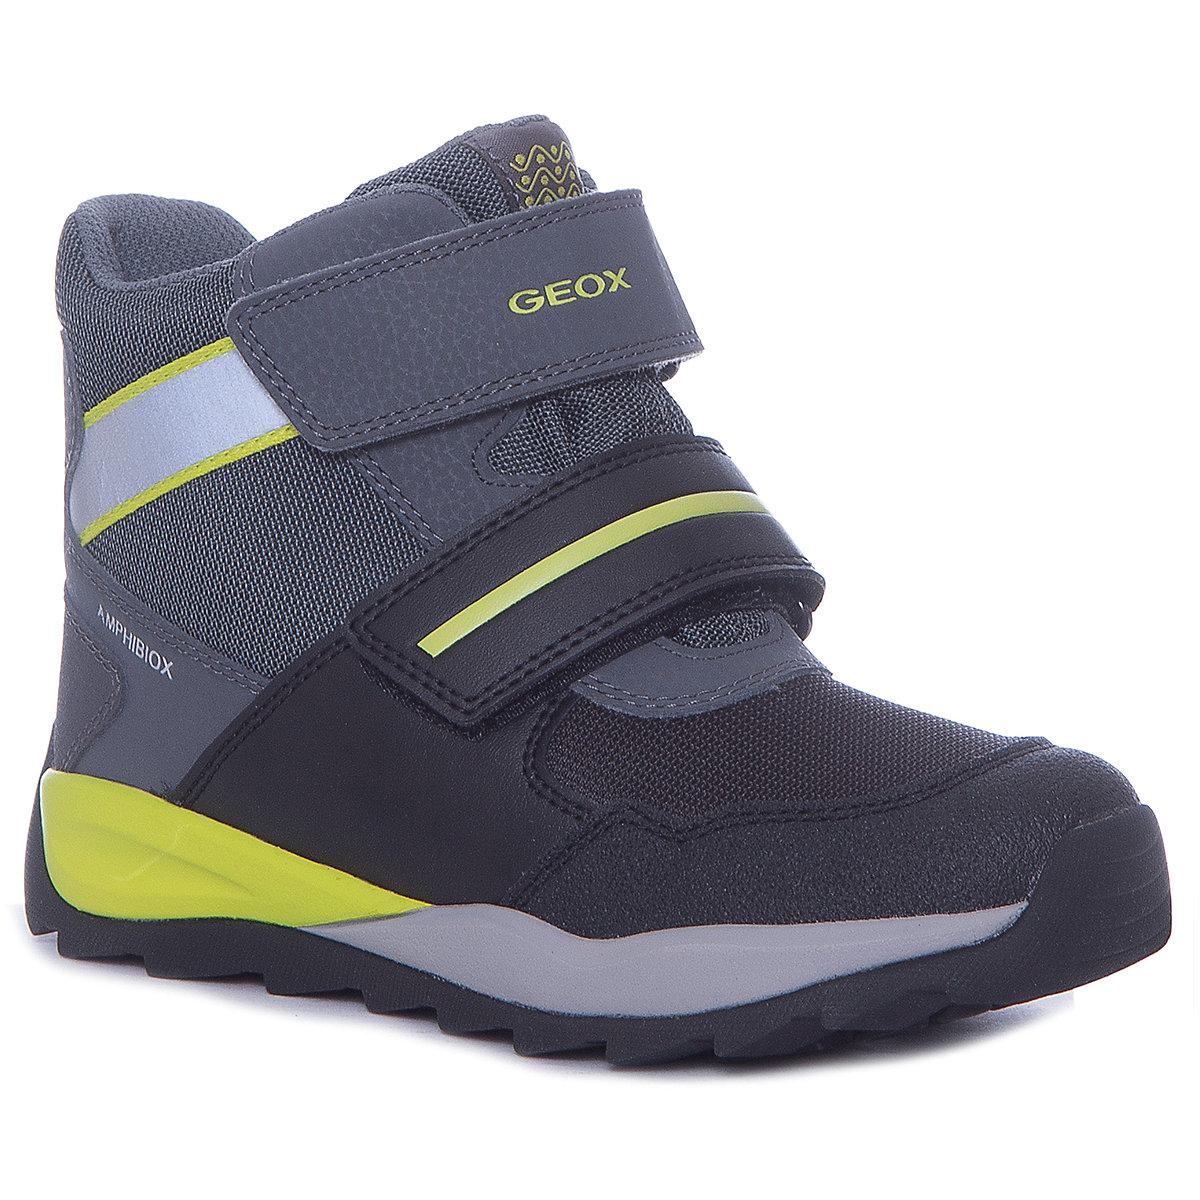 GEOX Boots 8786631 children shoes For boy Winter Boys faux fur MTpromo